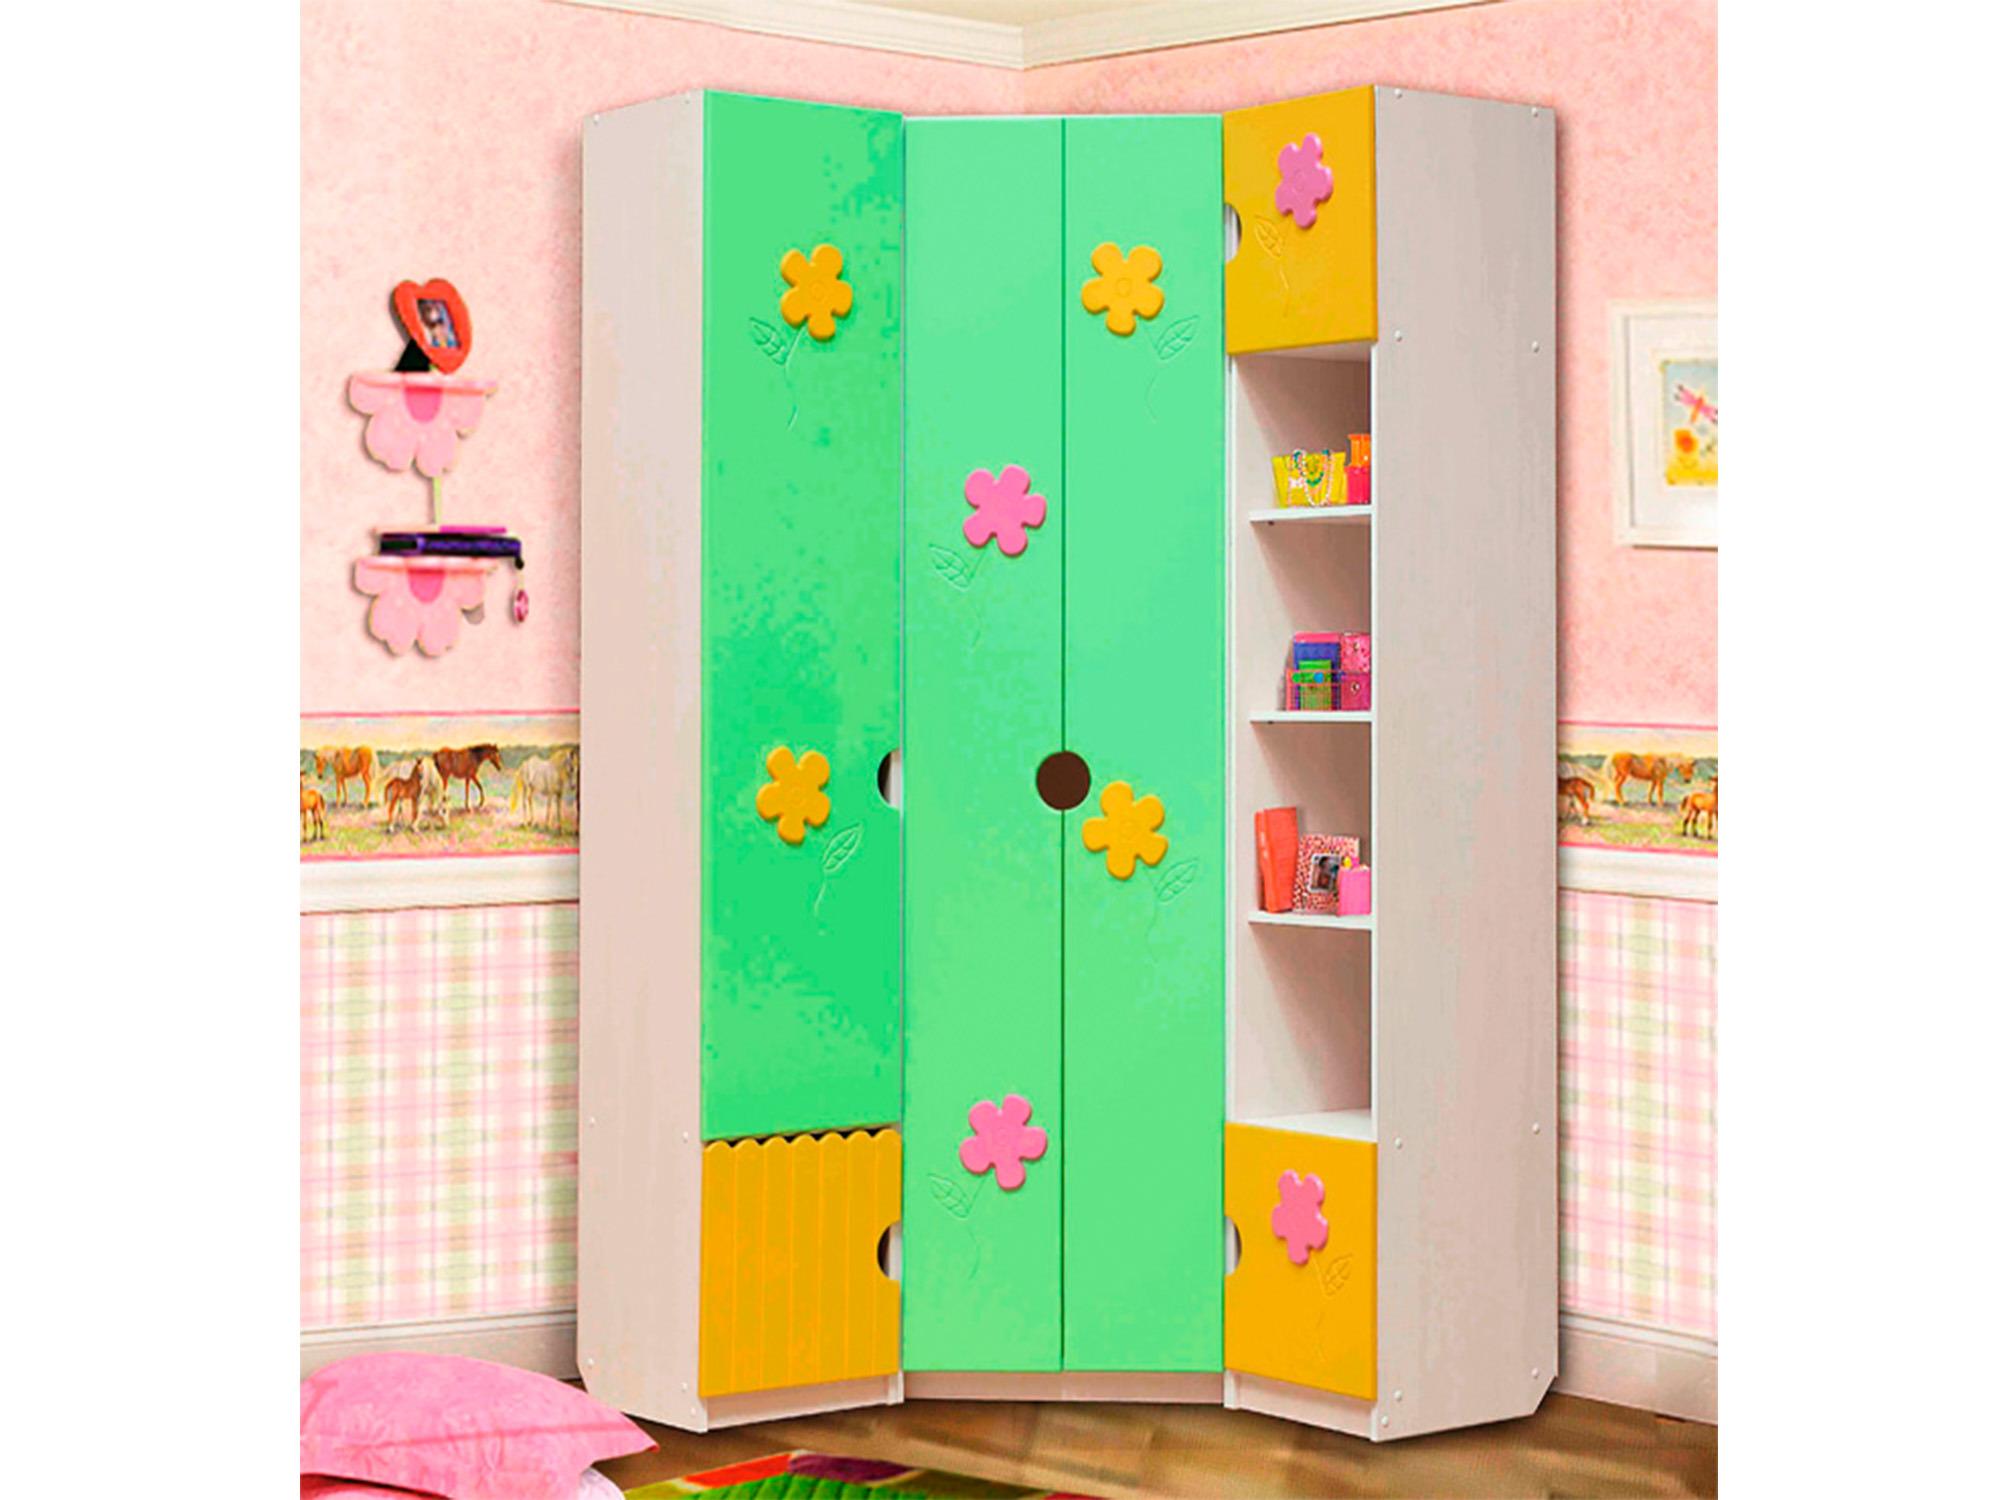 Шкаф угловой Цветочек-1Угловые шкафы<br><br><br>Длина мм: 0<br>Высота мм: 2201<br>Глубина мм: 450